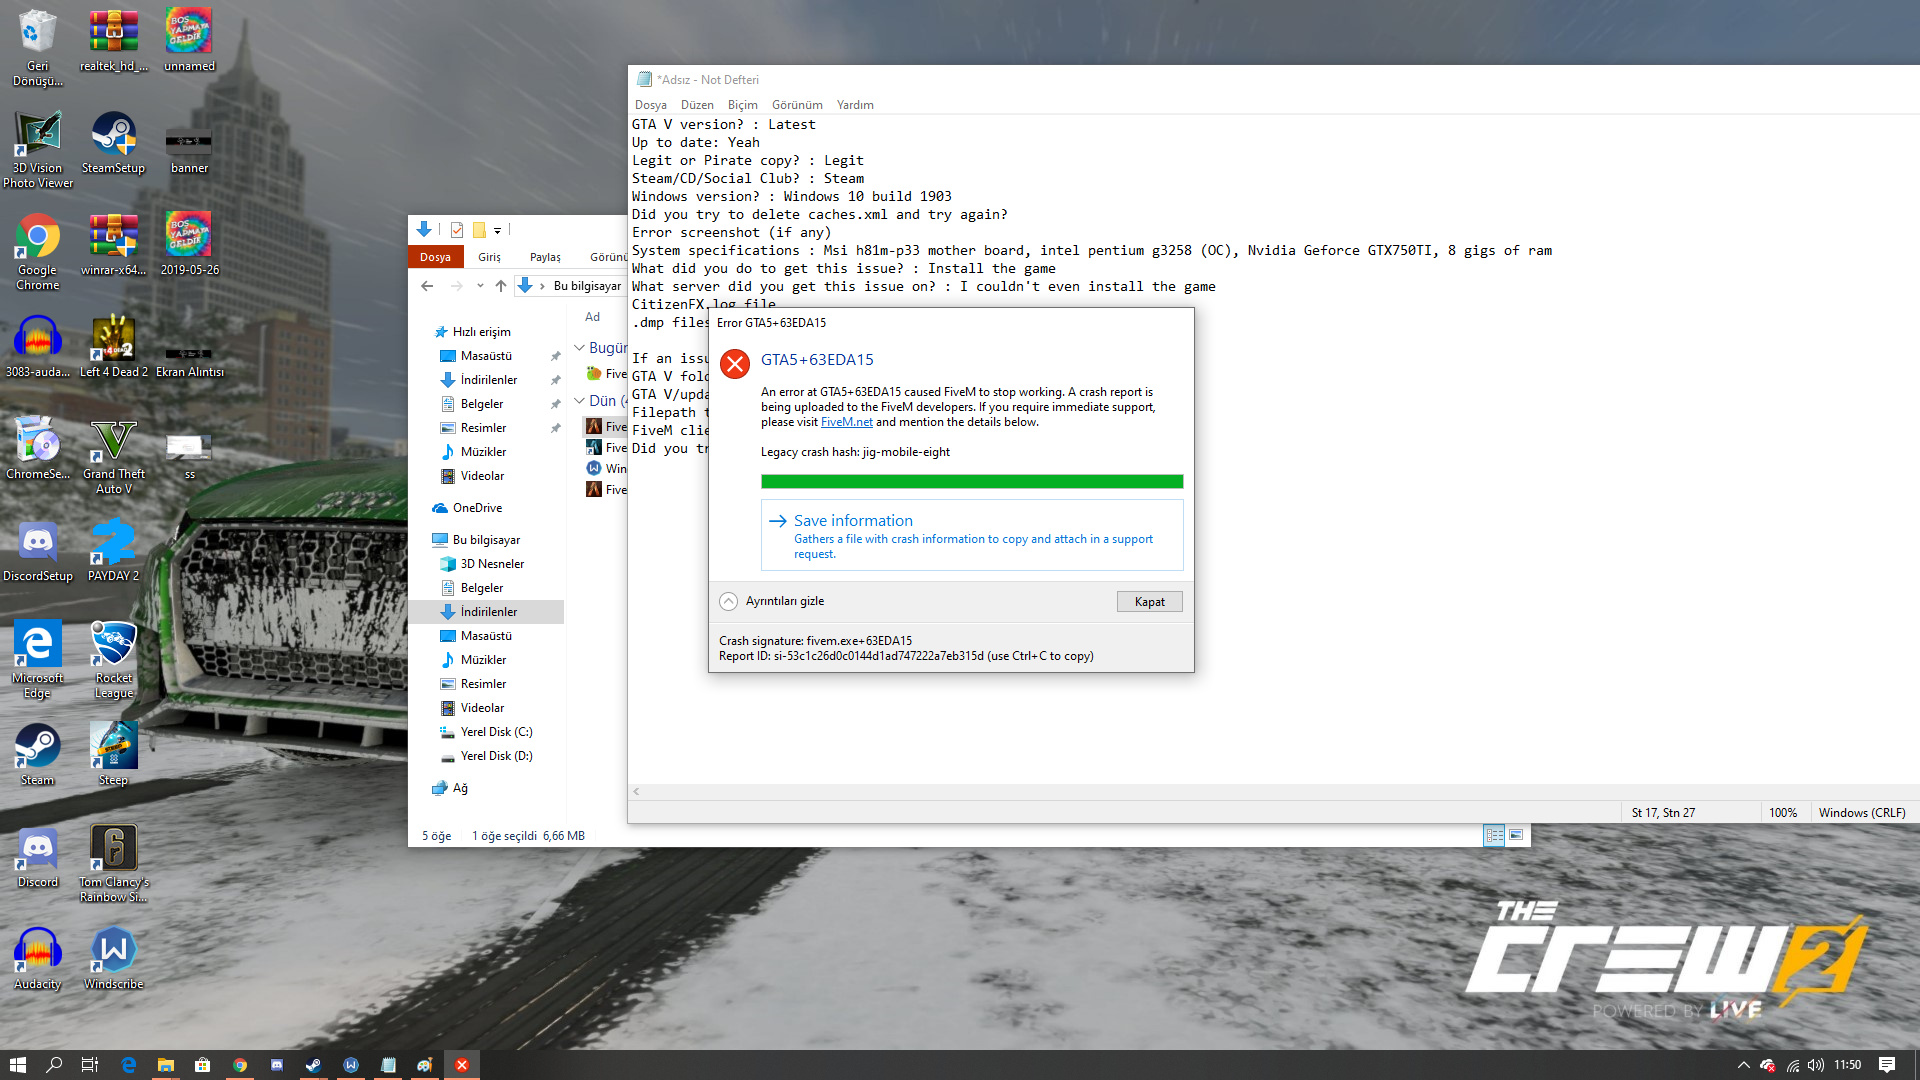 GTA 5 + 63EDA15 (microsoft visual) error - Technical Support - FiveM